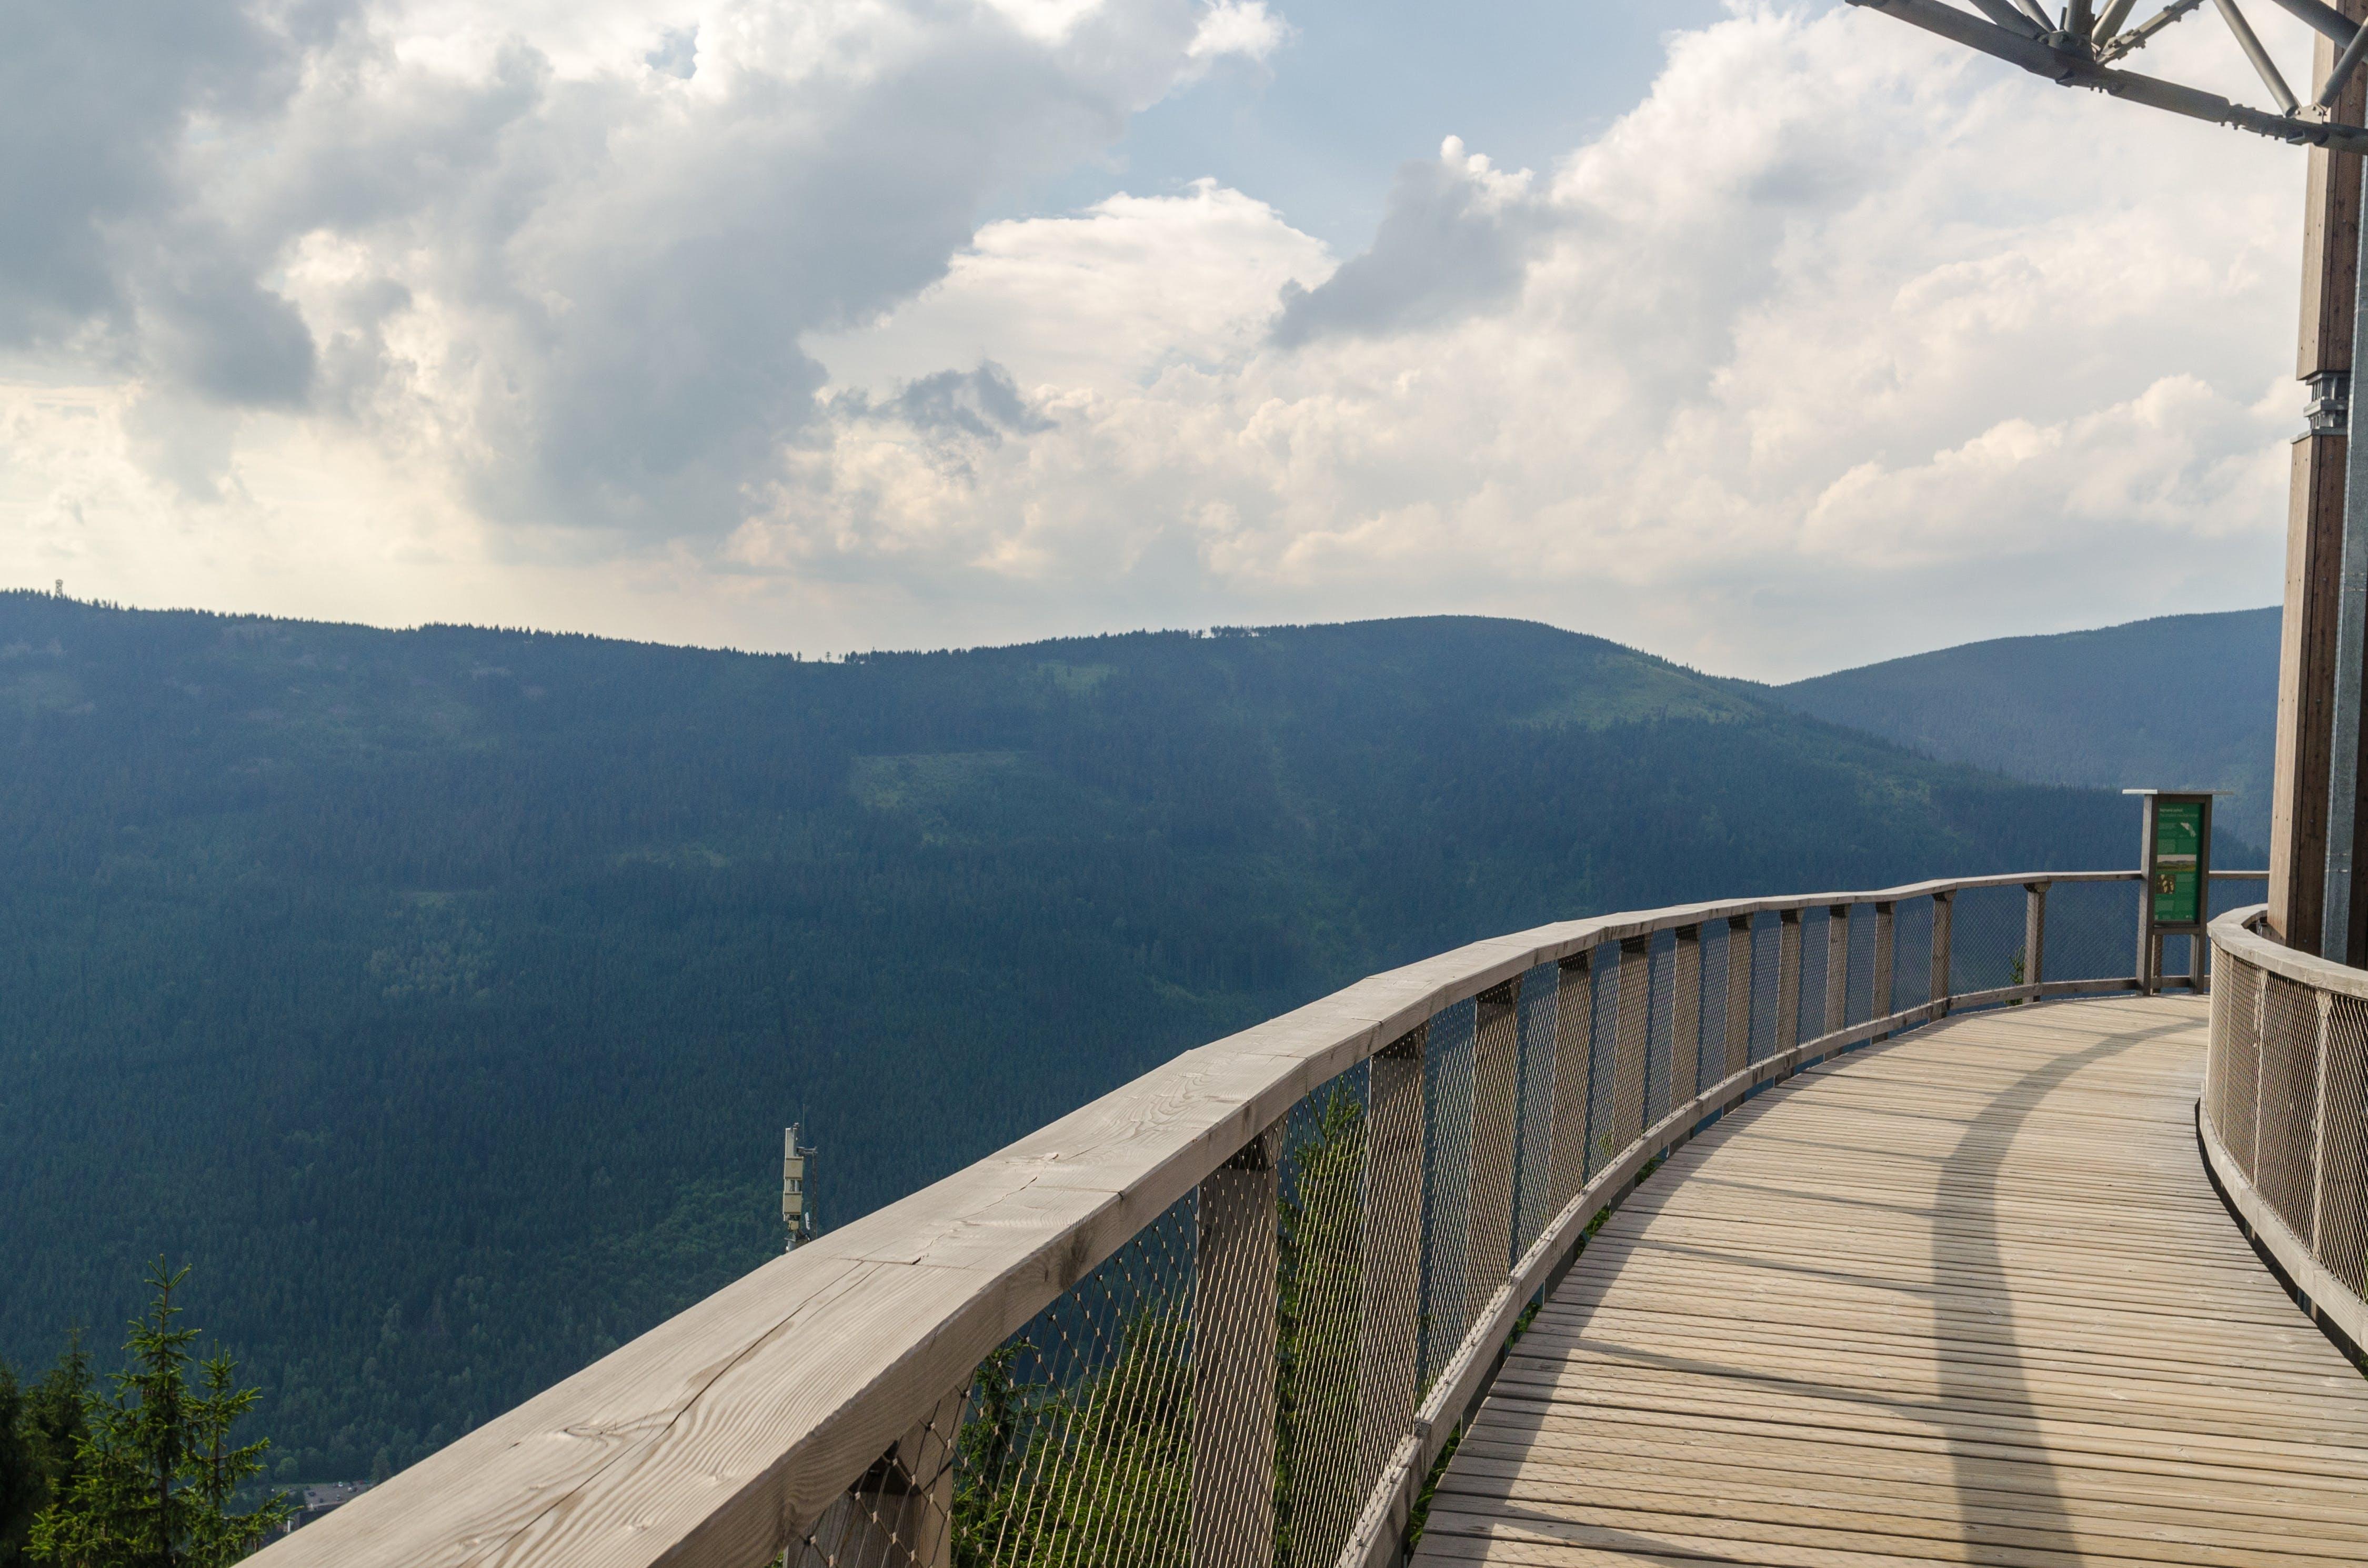 Beige Wooden Handrail